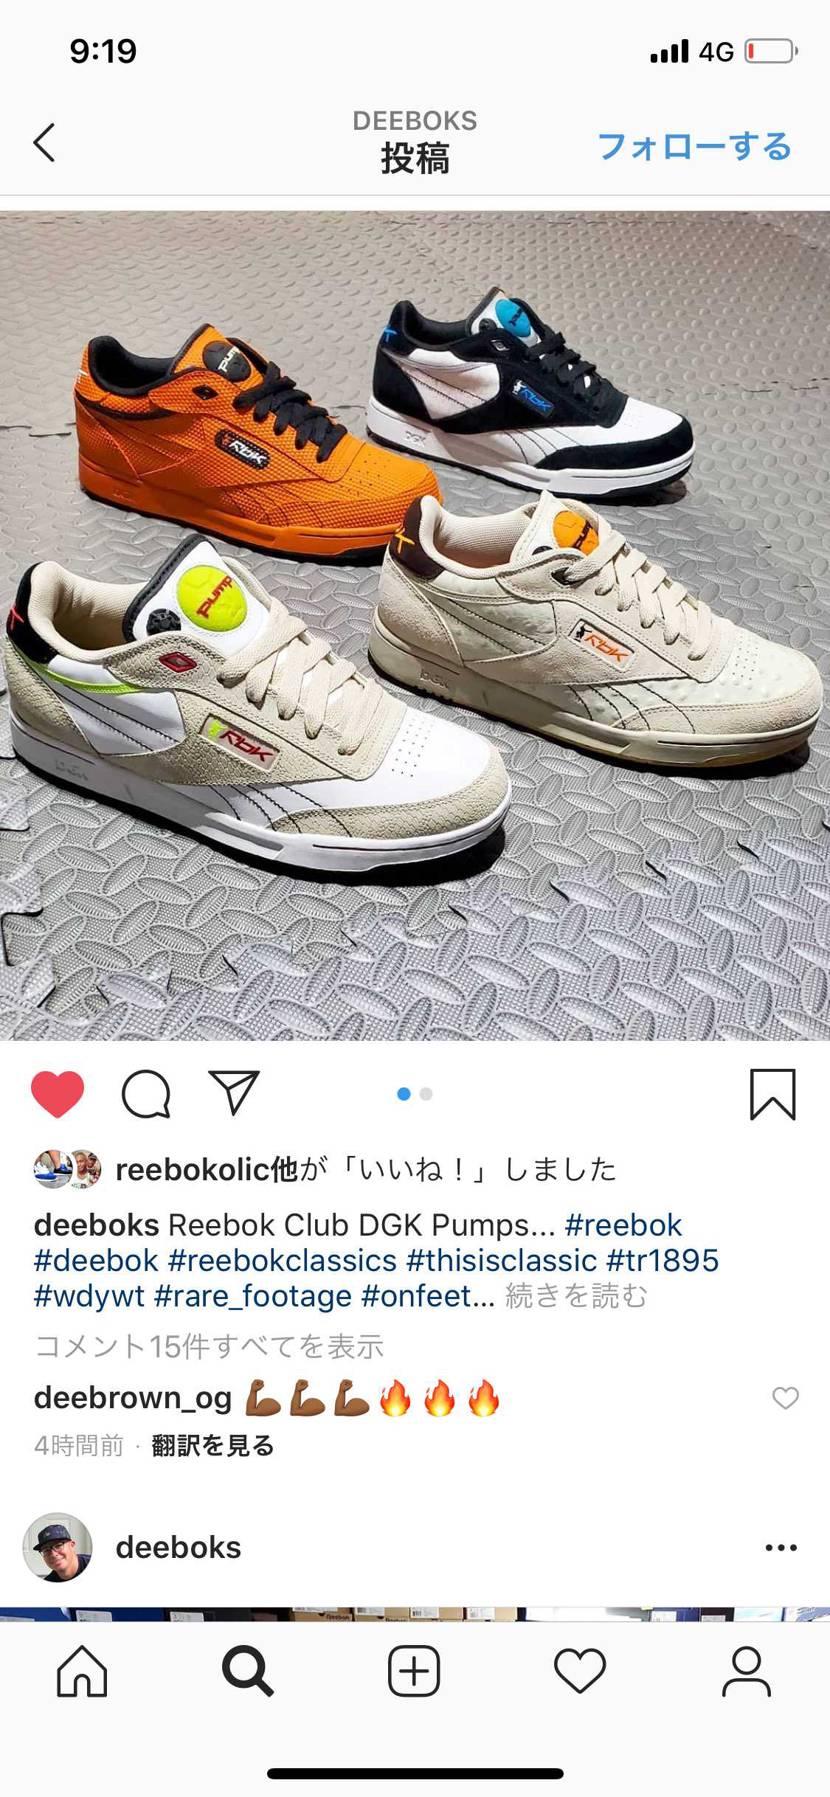 reebok club dgk club cをベースに、reebok を代表す